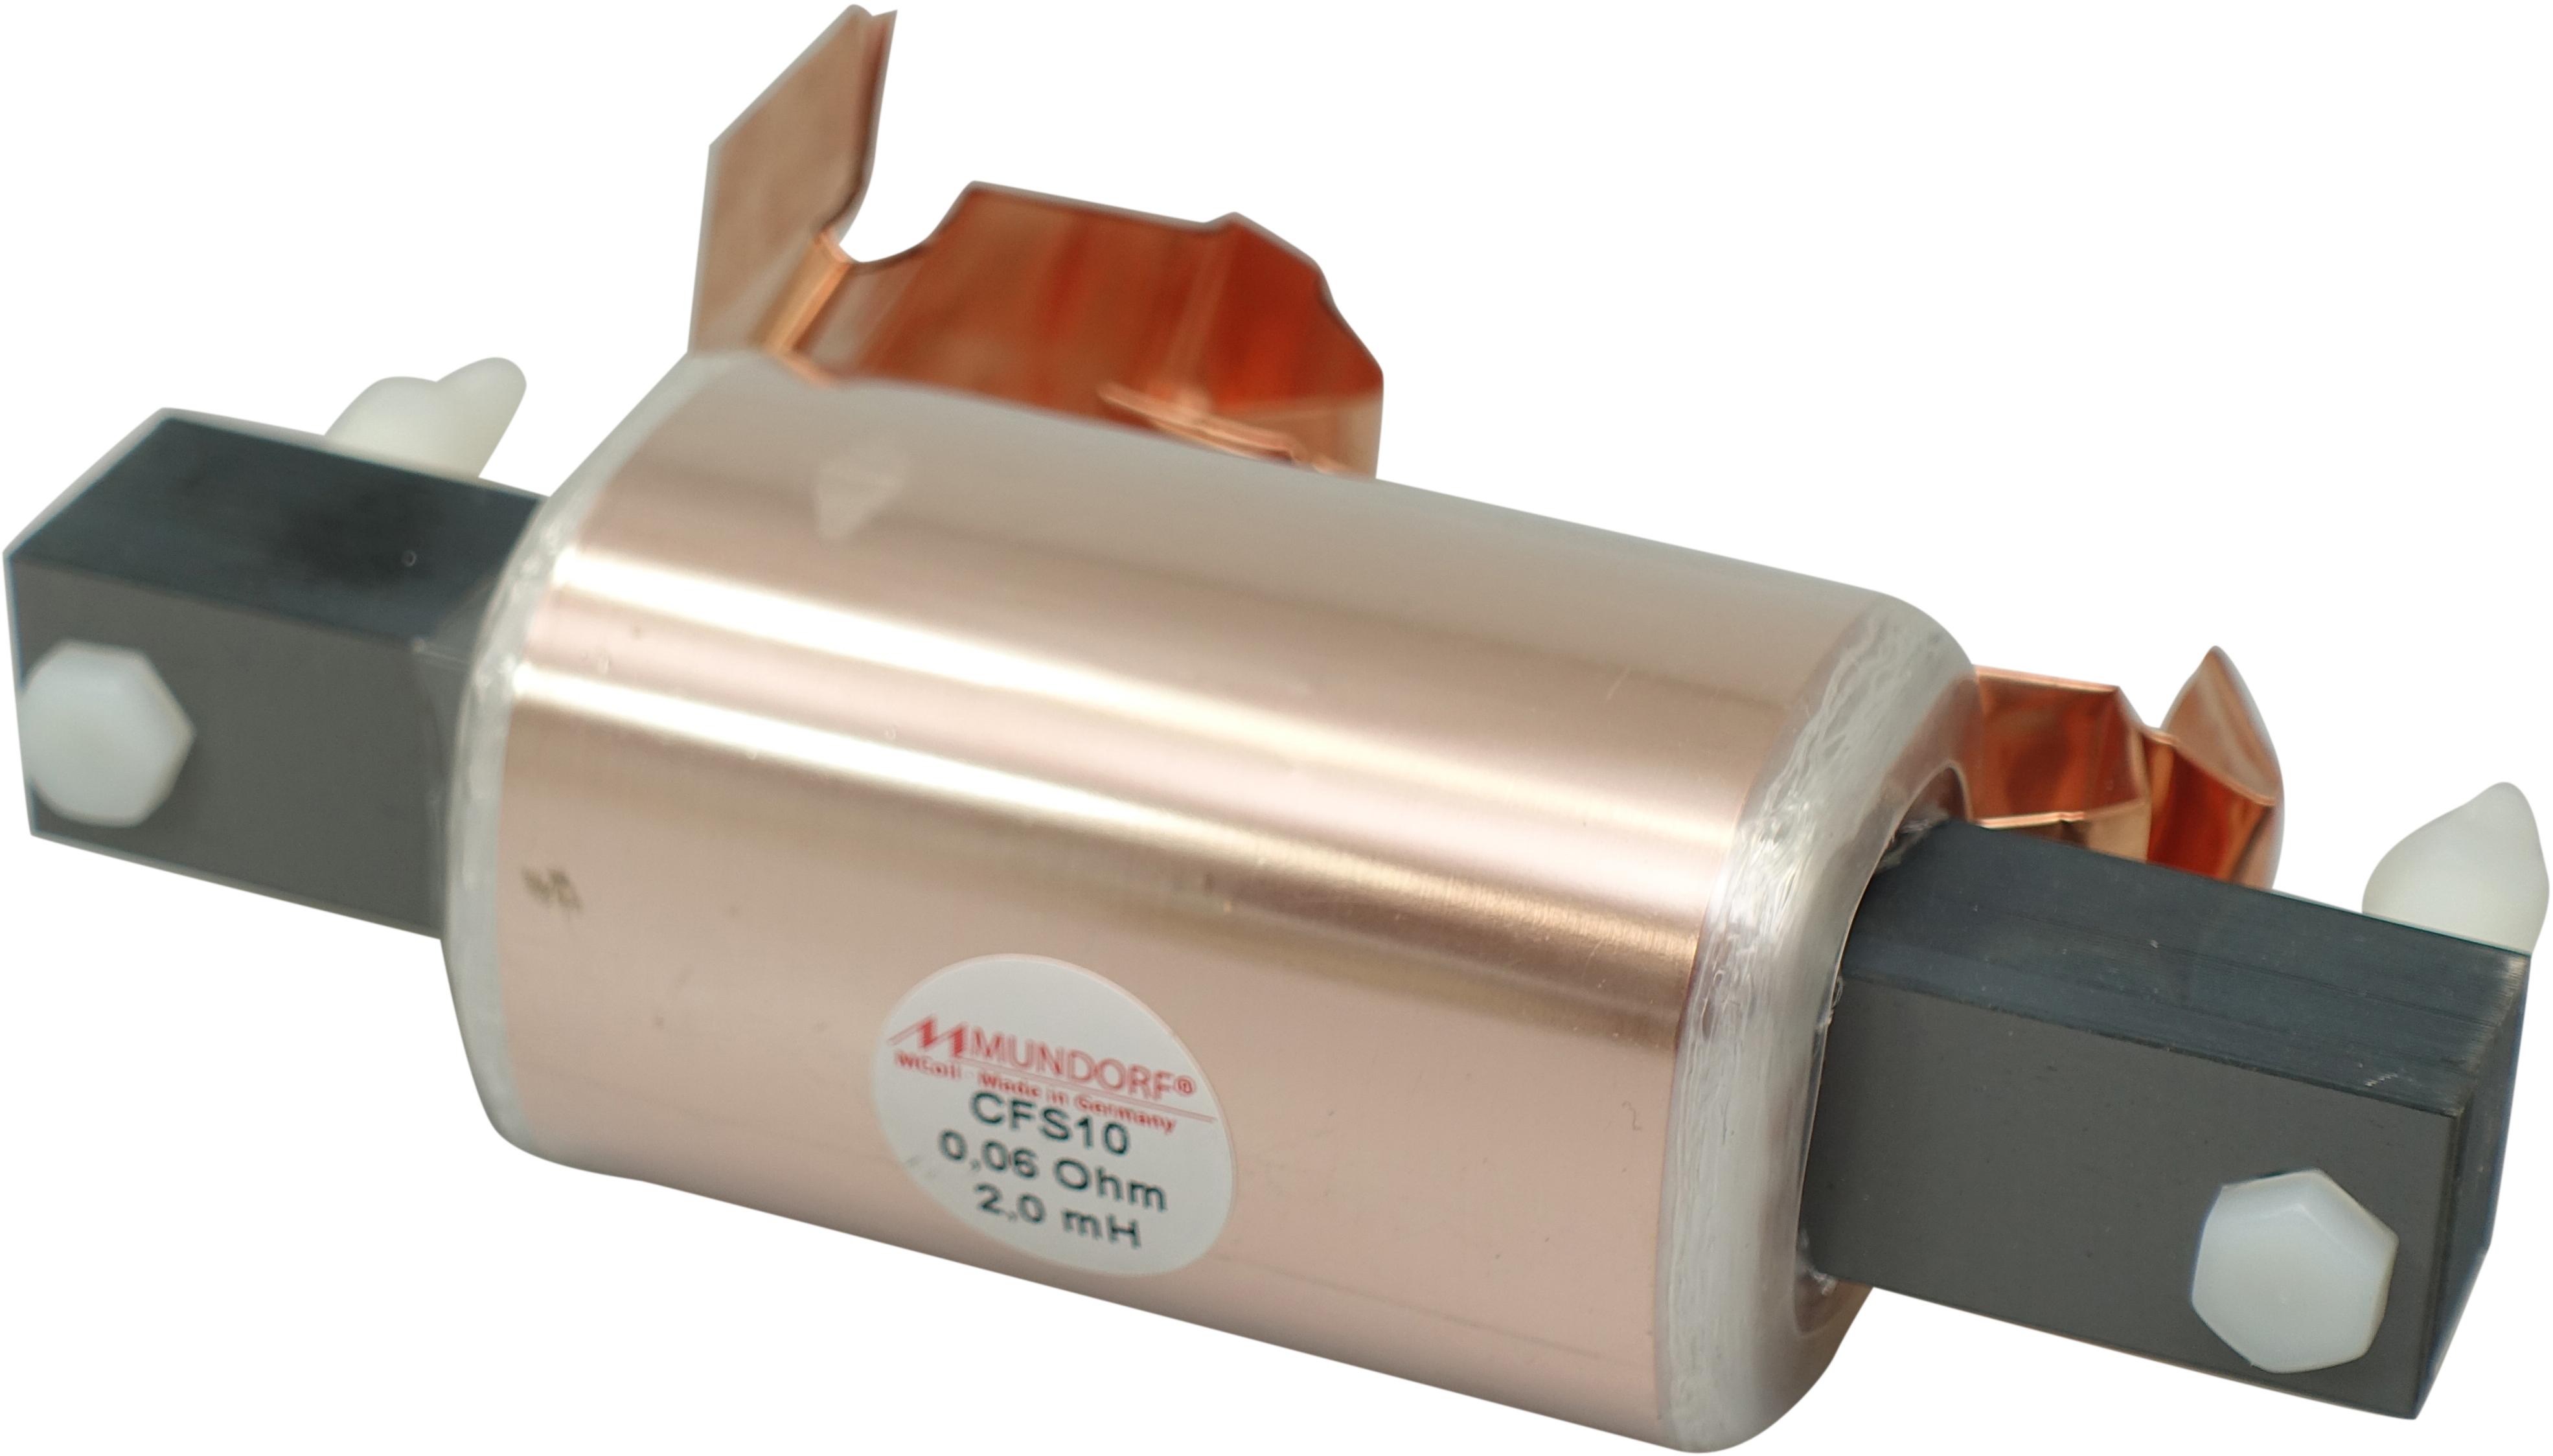 Mundorf MCoil CFS10-1,8mH